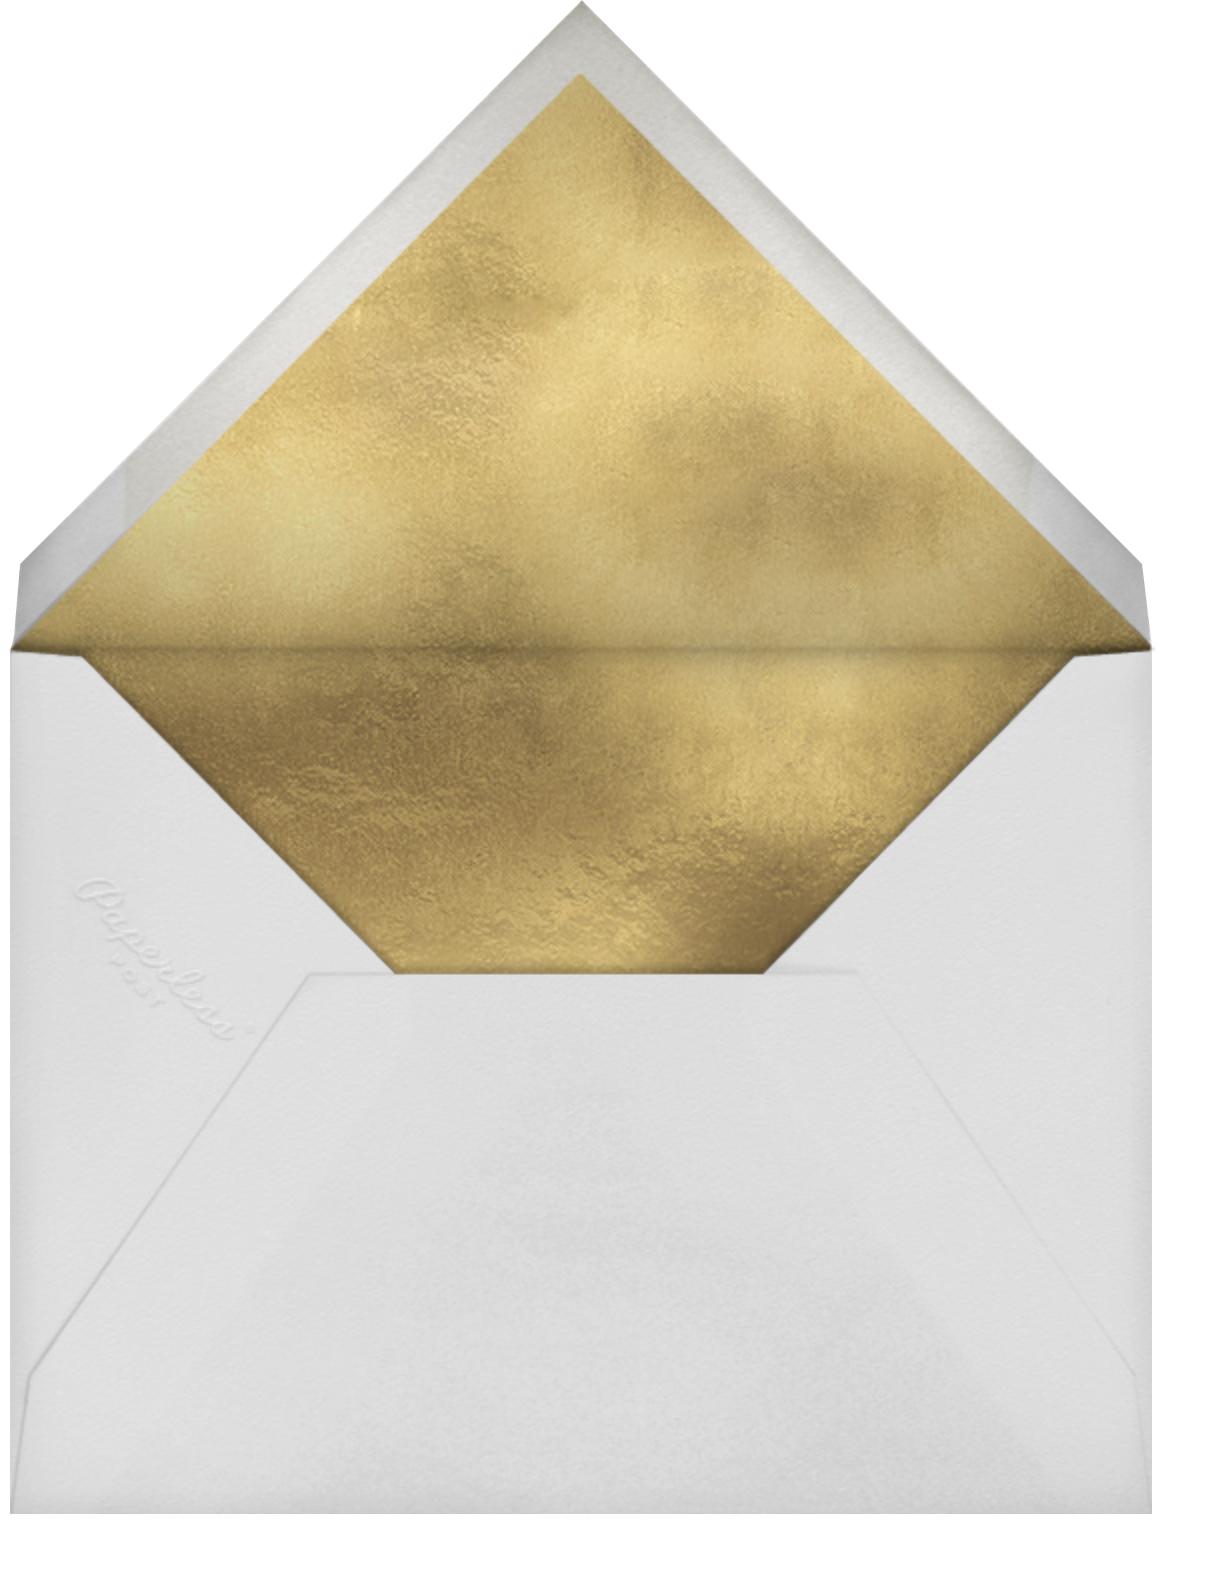 Better Daisies - White - Mr. Boddington's Studio - Bar and bat mitzvah - envelope back